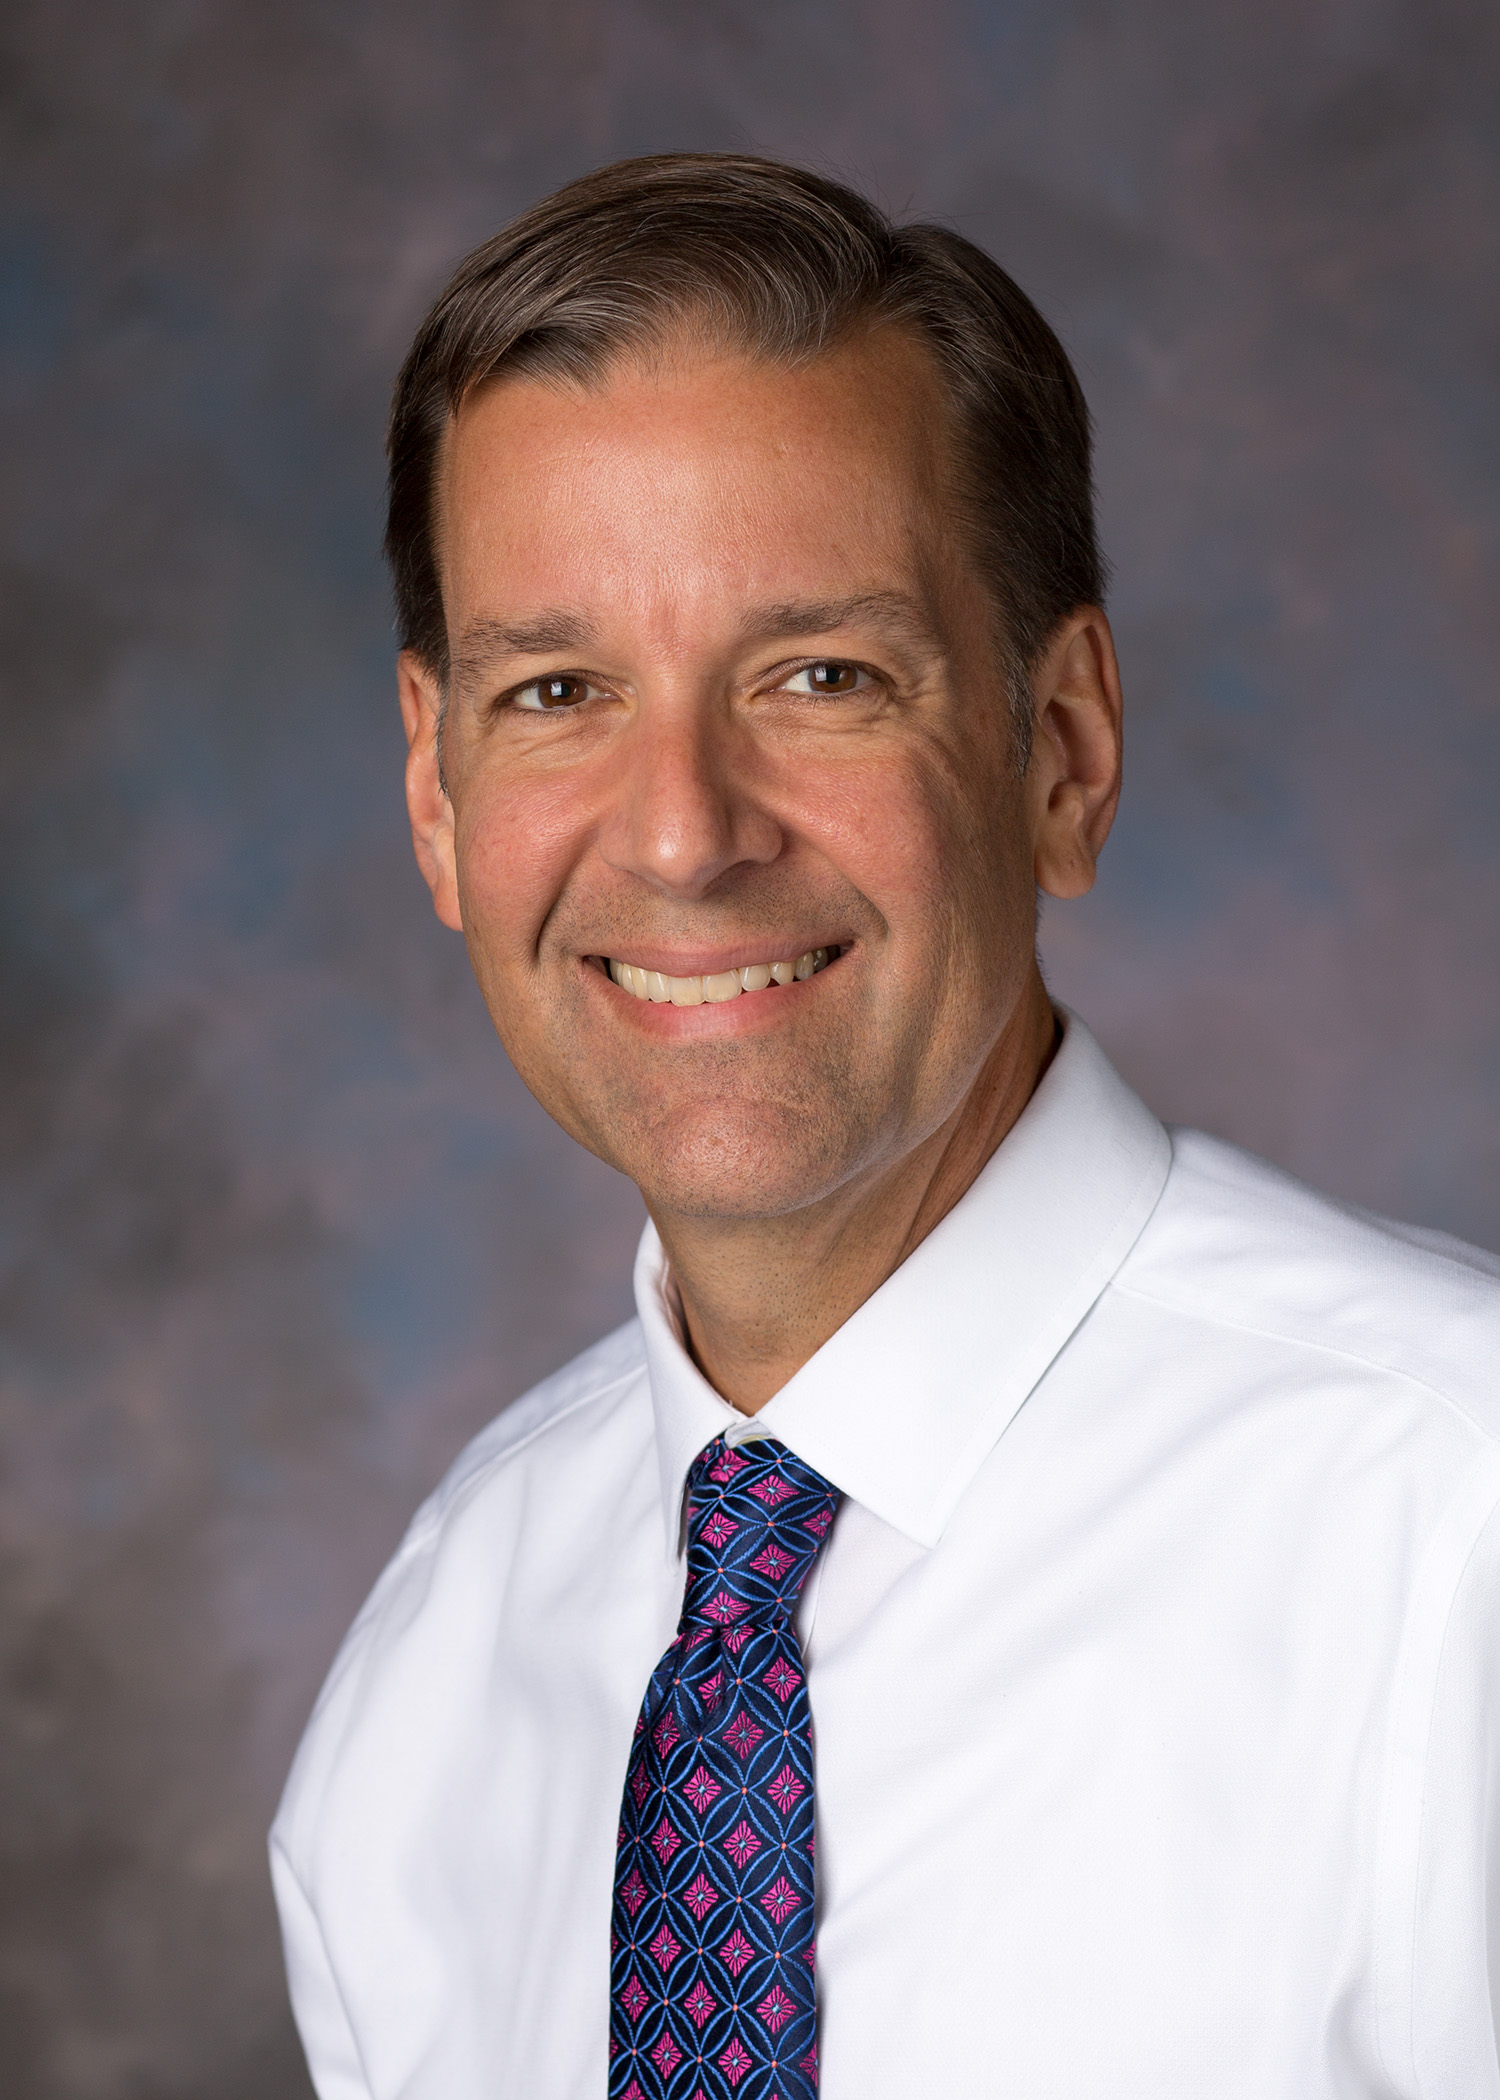 THOMAS BARTMAN, MD, PhD